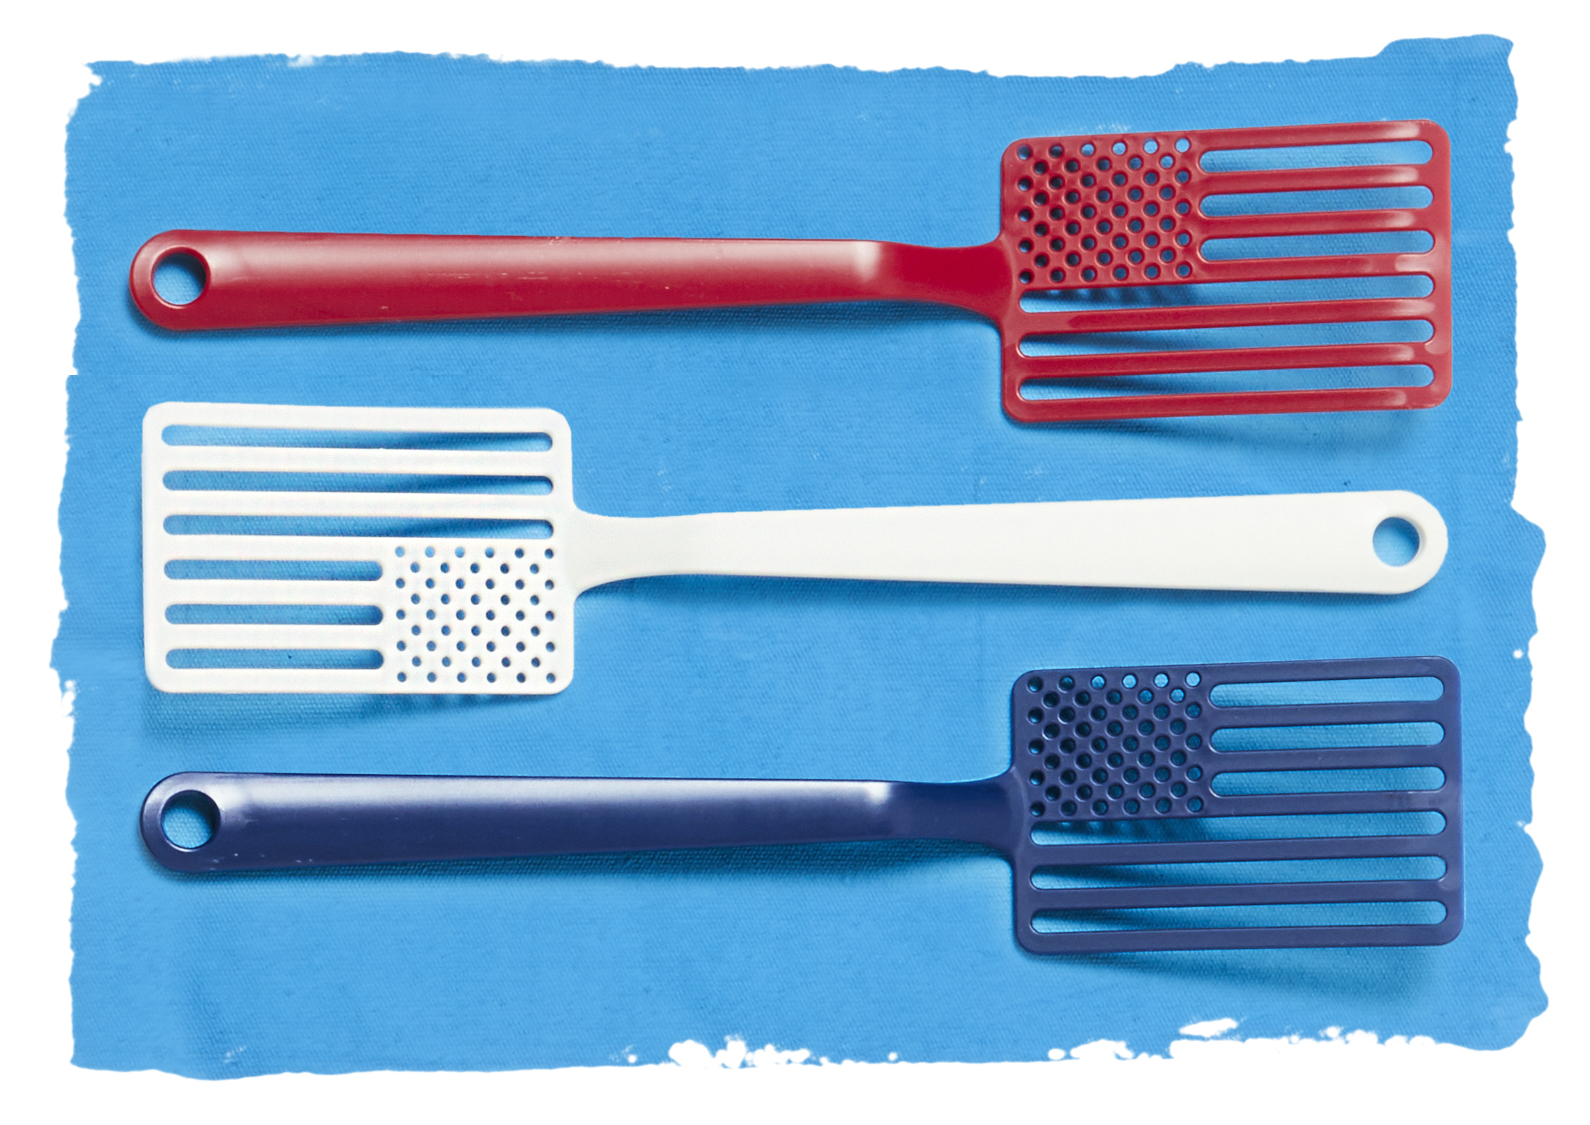 star spangled spatulas on blue